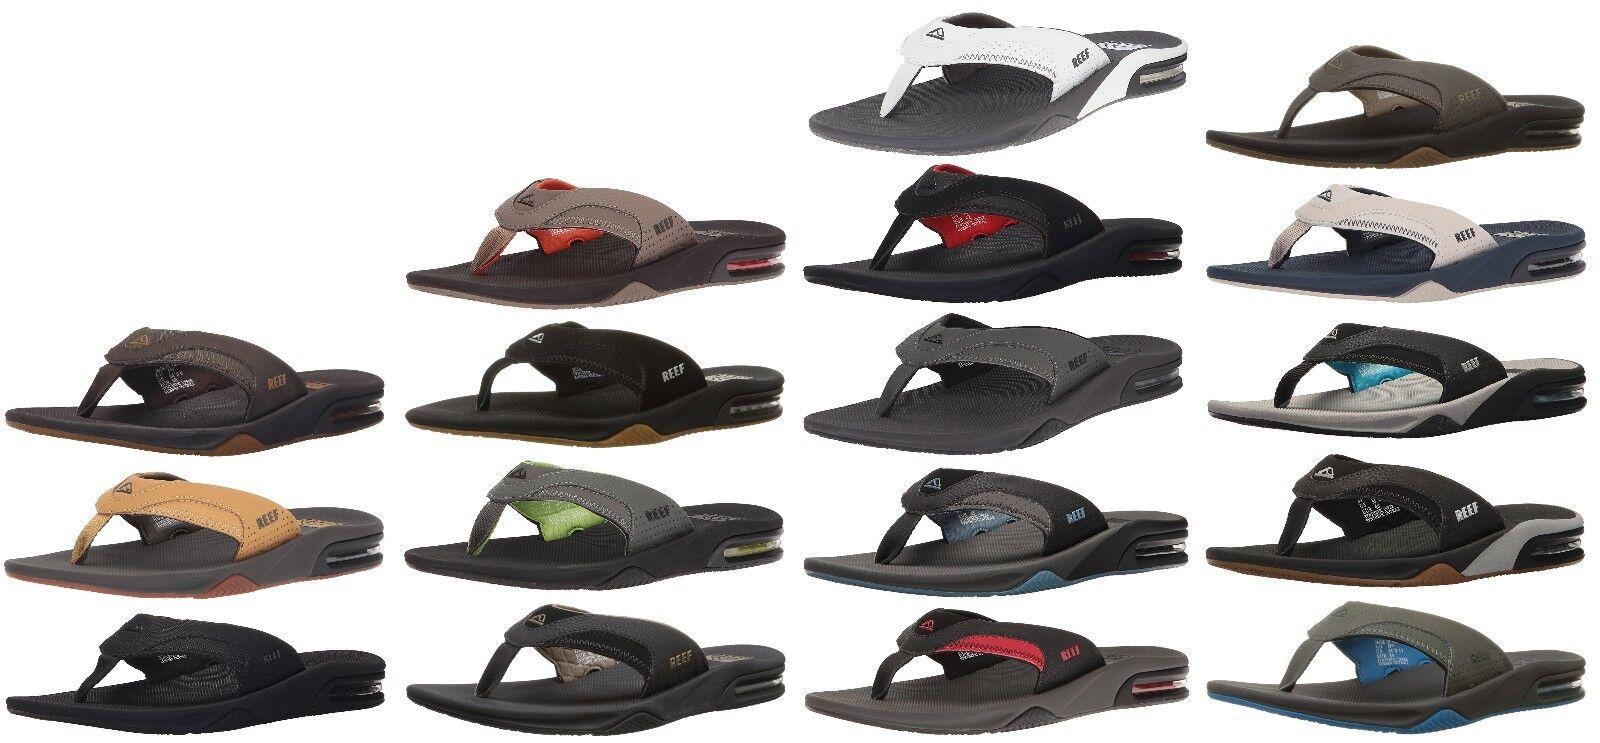 Gentleman/Lady Reef Men's Fanning Low Sandal Exquisite (middle) workmanship Low Fanning price business cda111